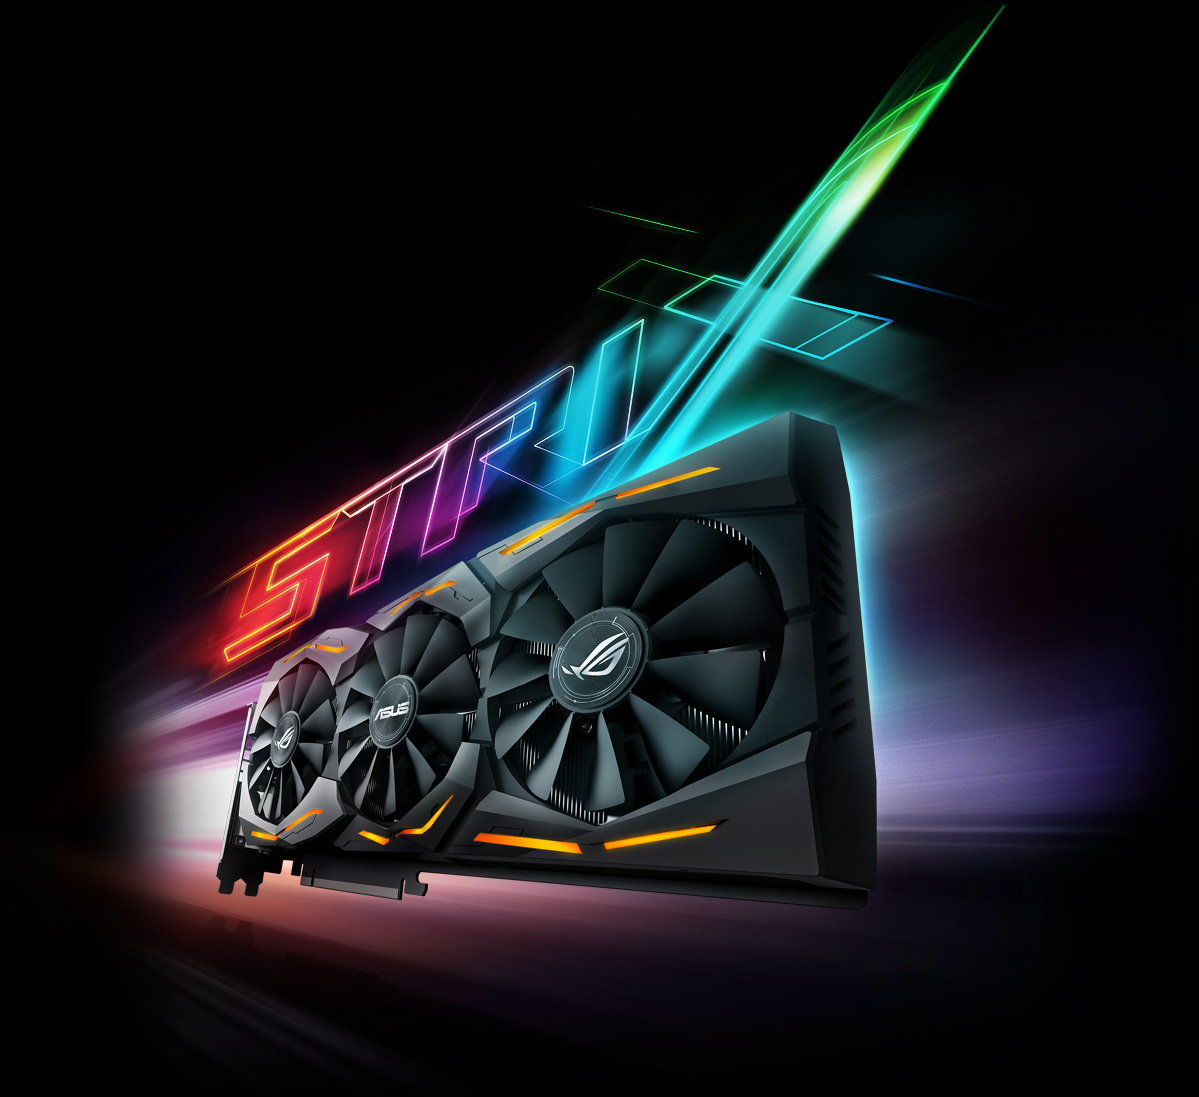 Asus Strix Gaming Geforce GTX-1080 OC 8GB